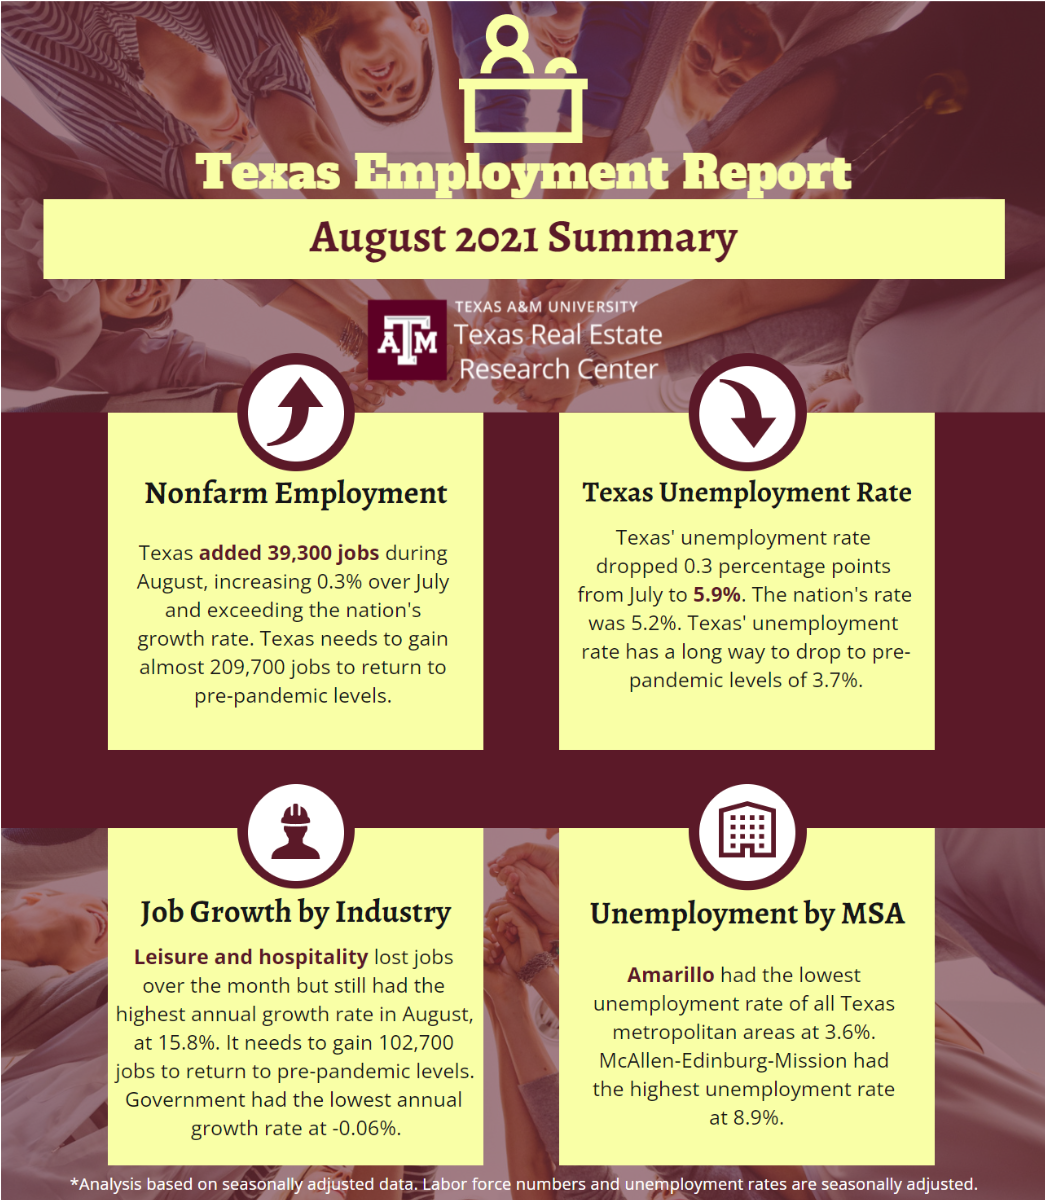 Texas Employment Report - August 2021